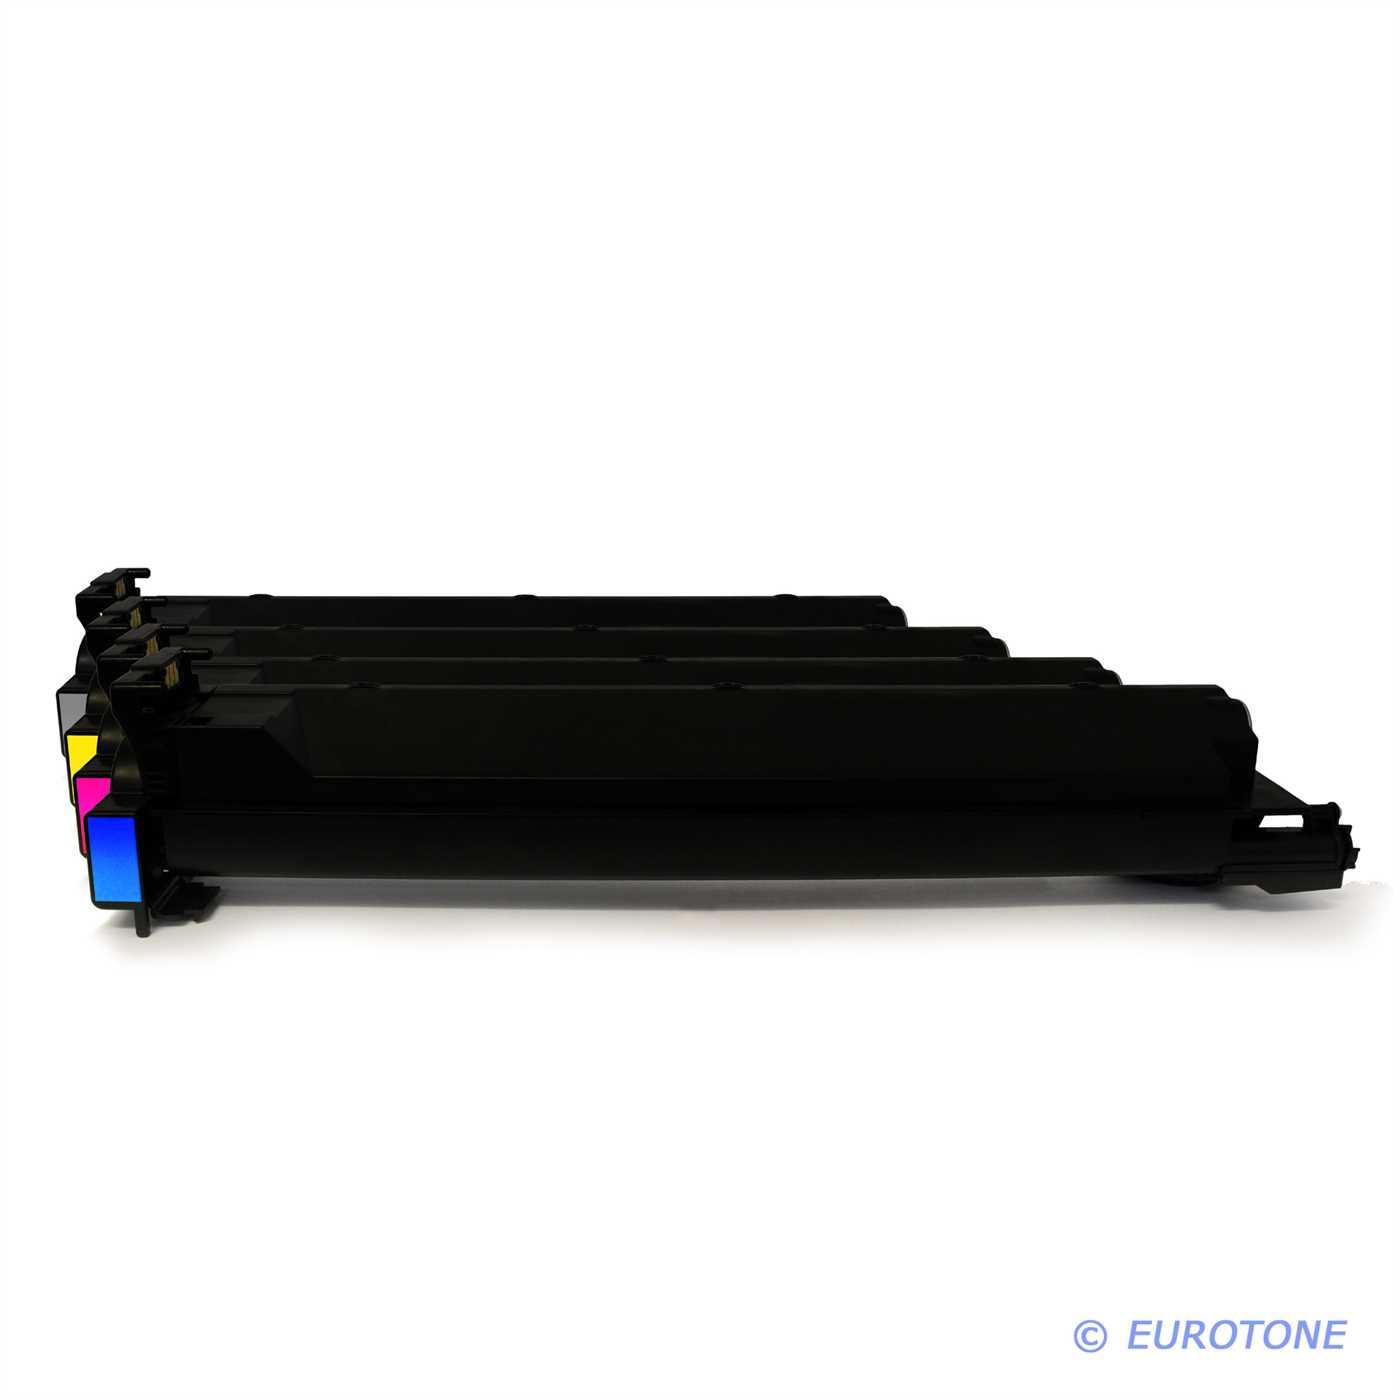 4x-PRIME-Patrone-Chip-fuer-Konica-Minolta-Bizhub-C-253-C-203